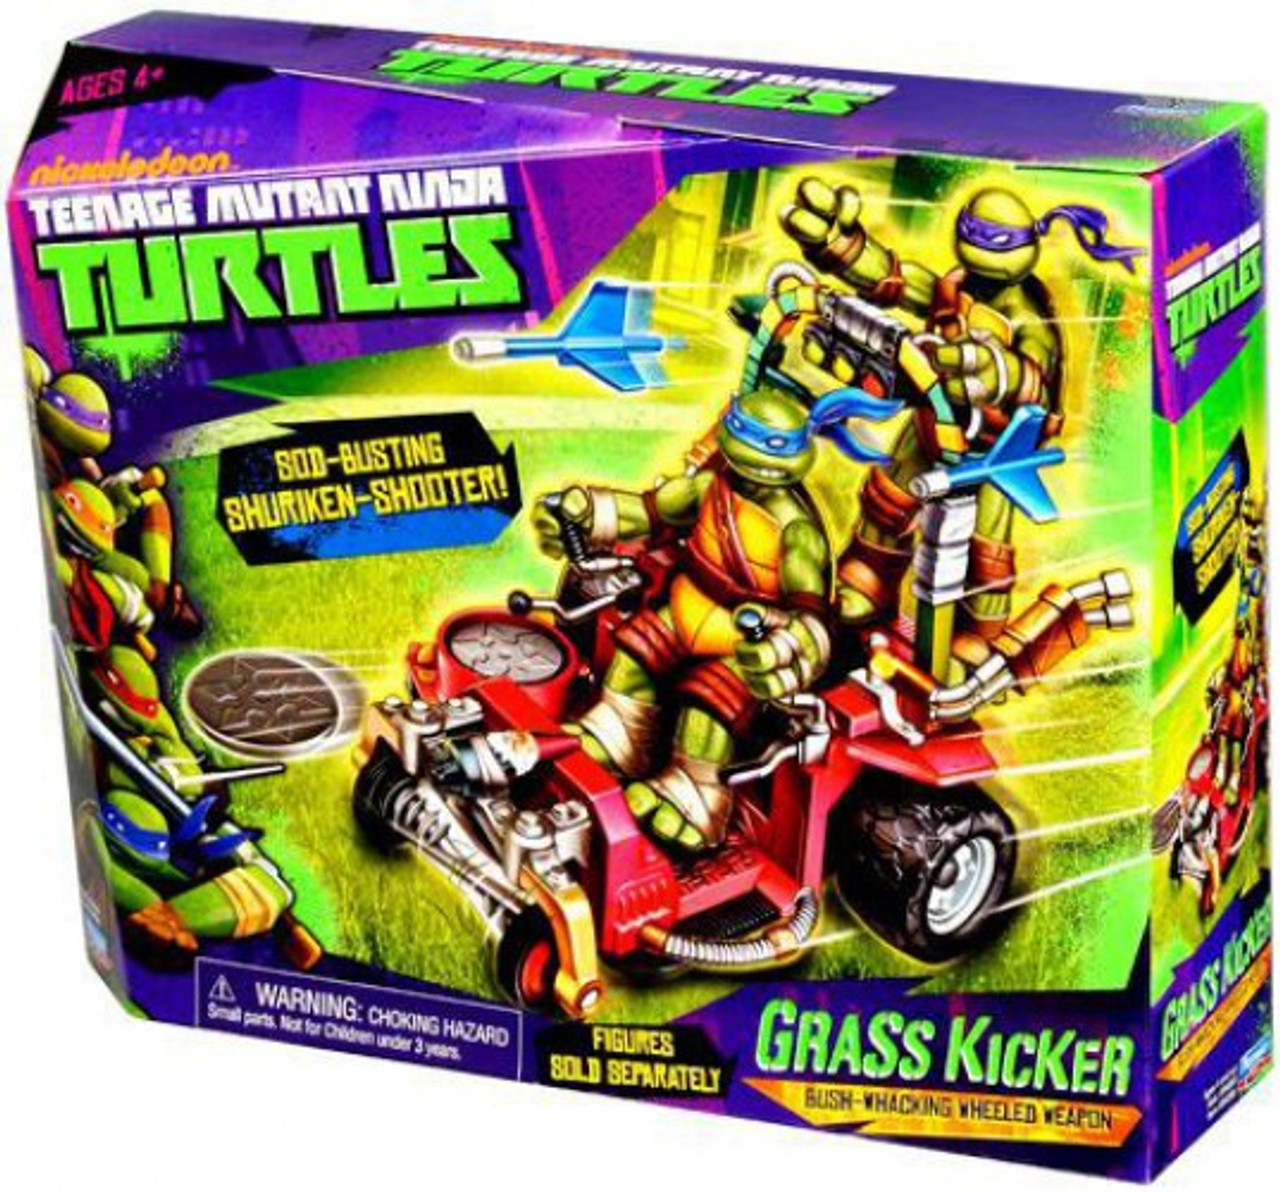 Teenage Mutant Ninja Turtles Nickelodeon Grass Kicker Action Figure Vehicle